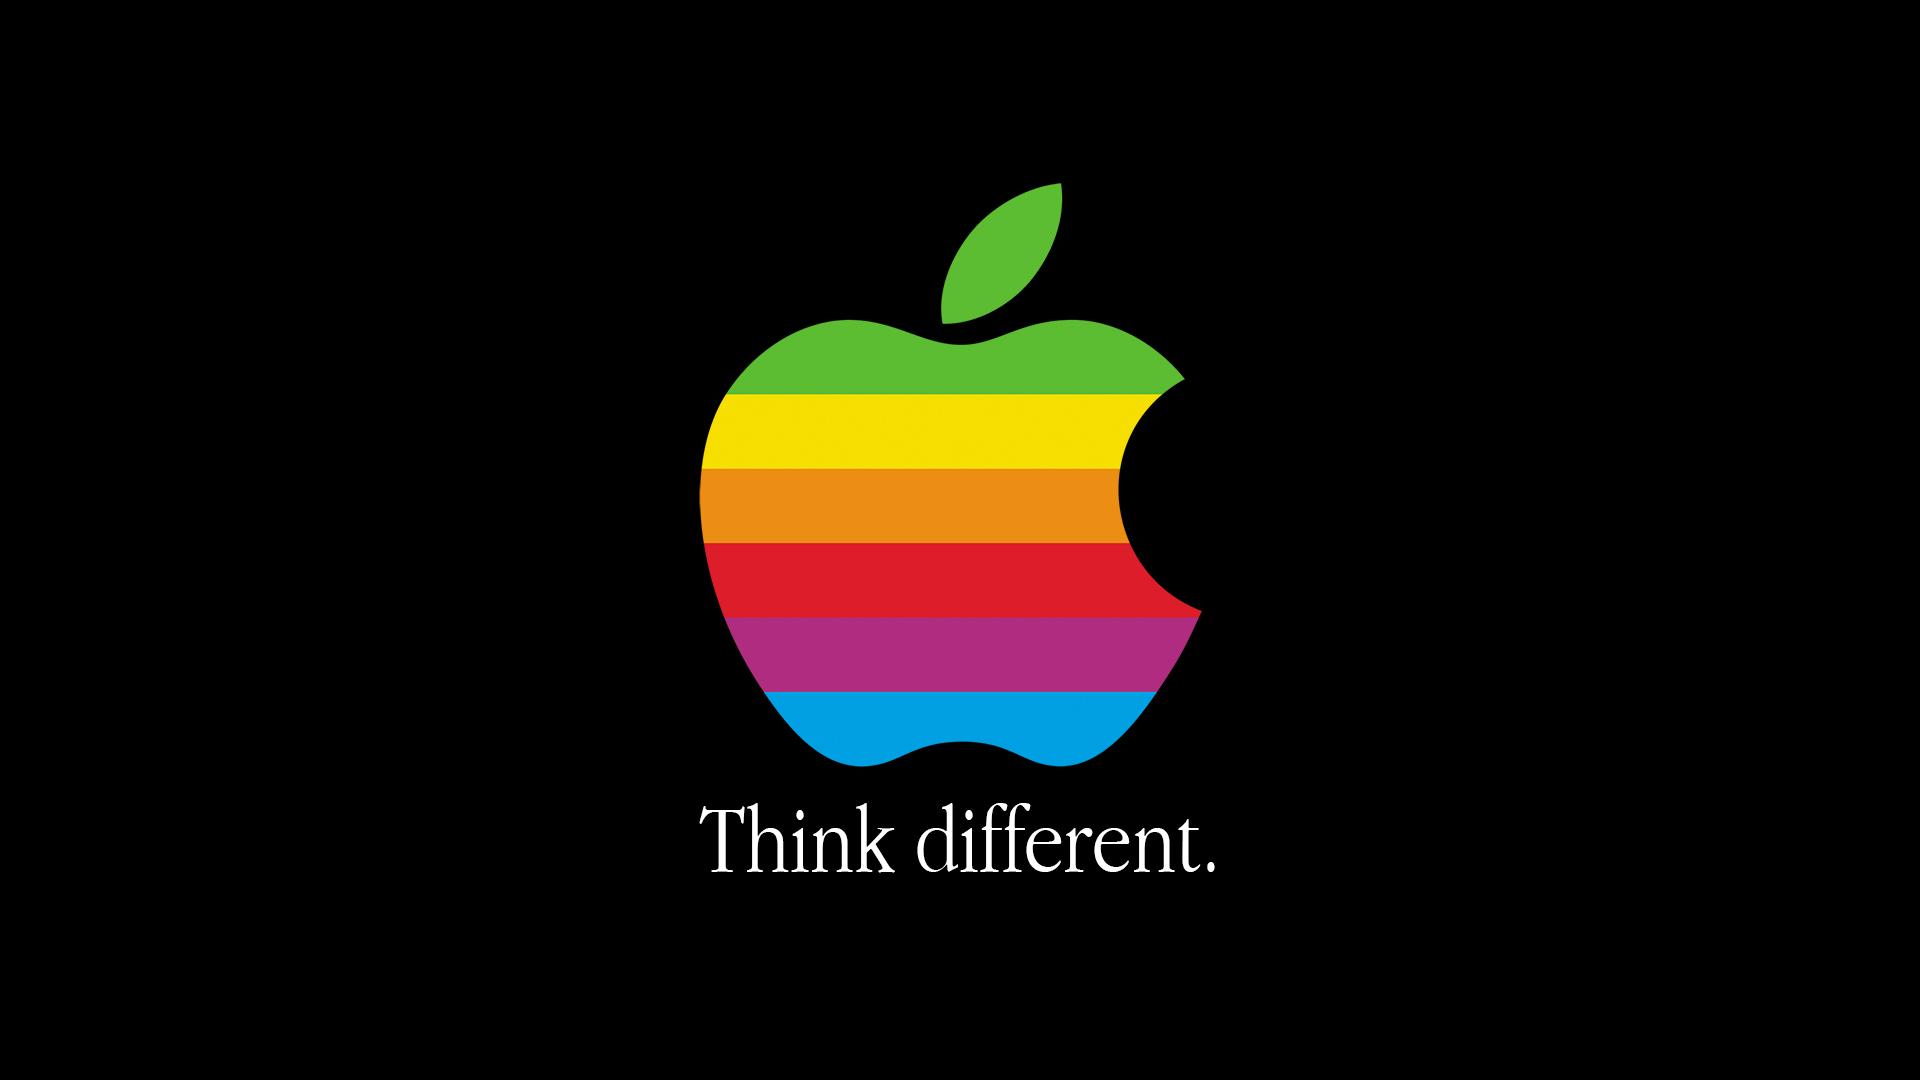 ThinkDifferentClassic